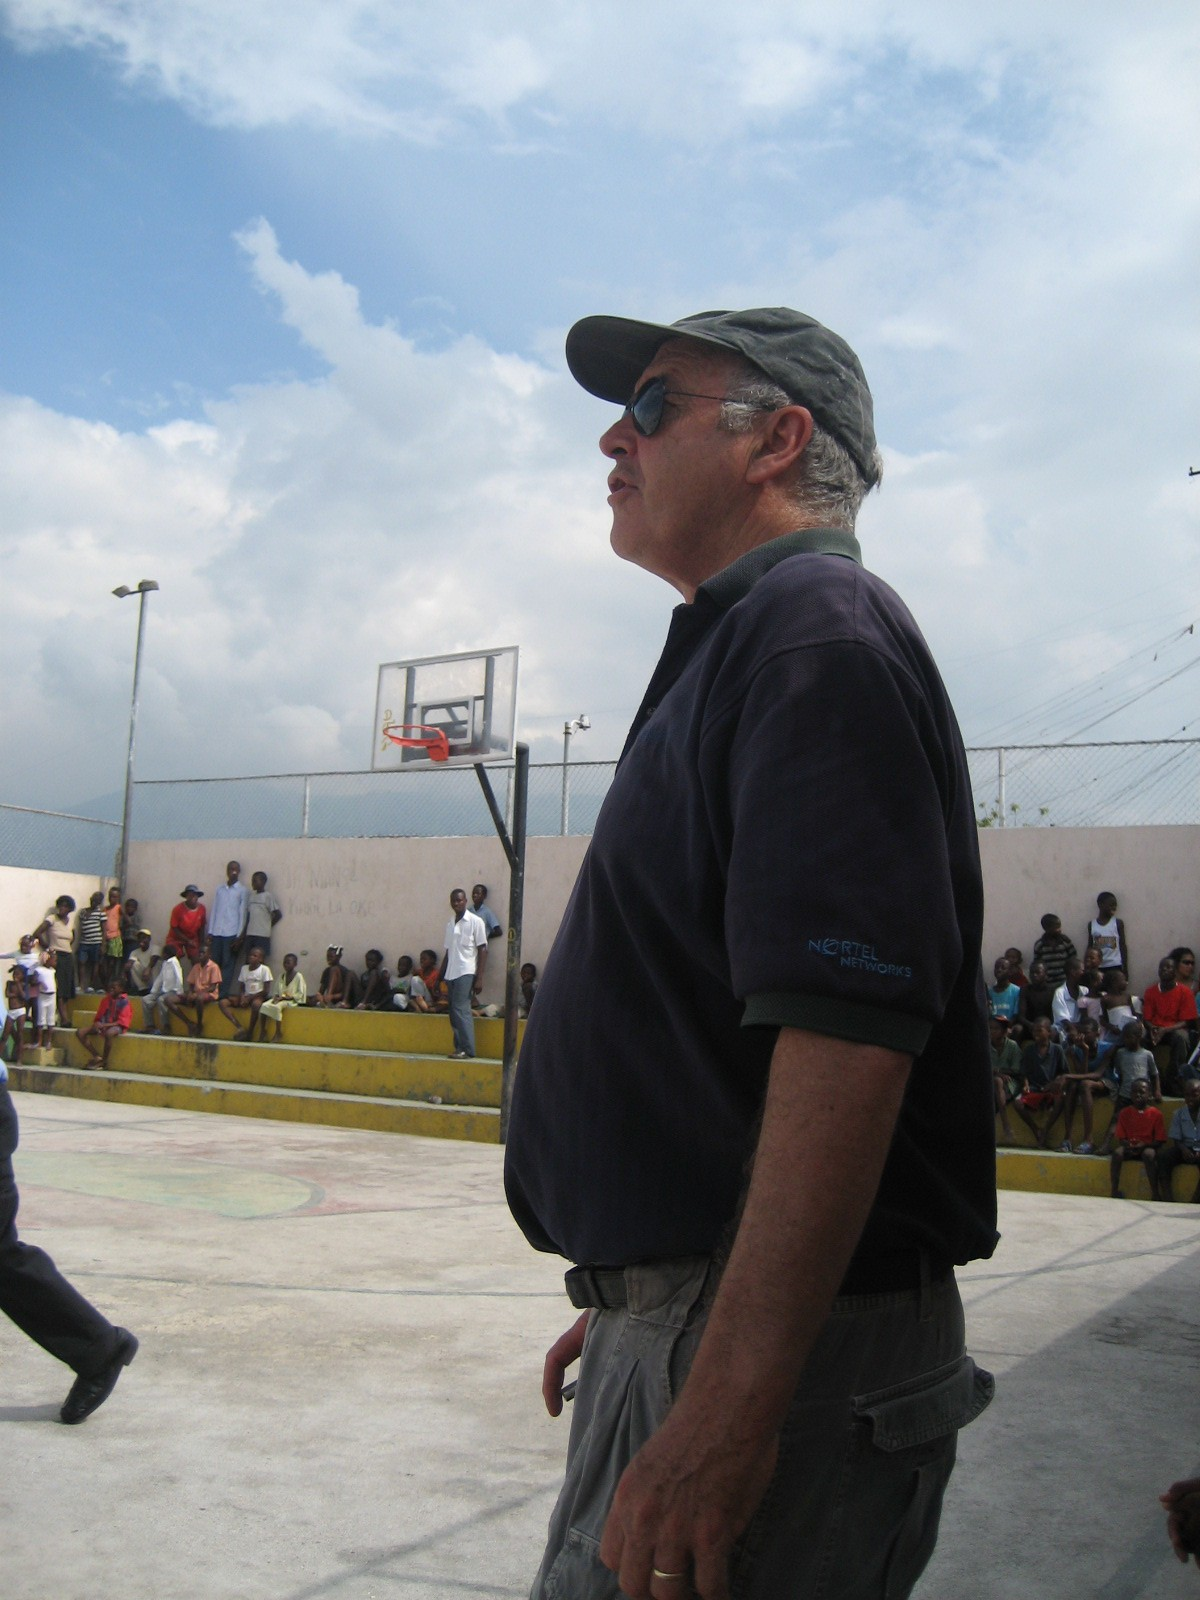 2007. Haiti, TWA, Third World Awareness, charity, non-profit, volunteer, basketball court, Cite Soleil, basketball game, volunteering, community